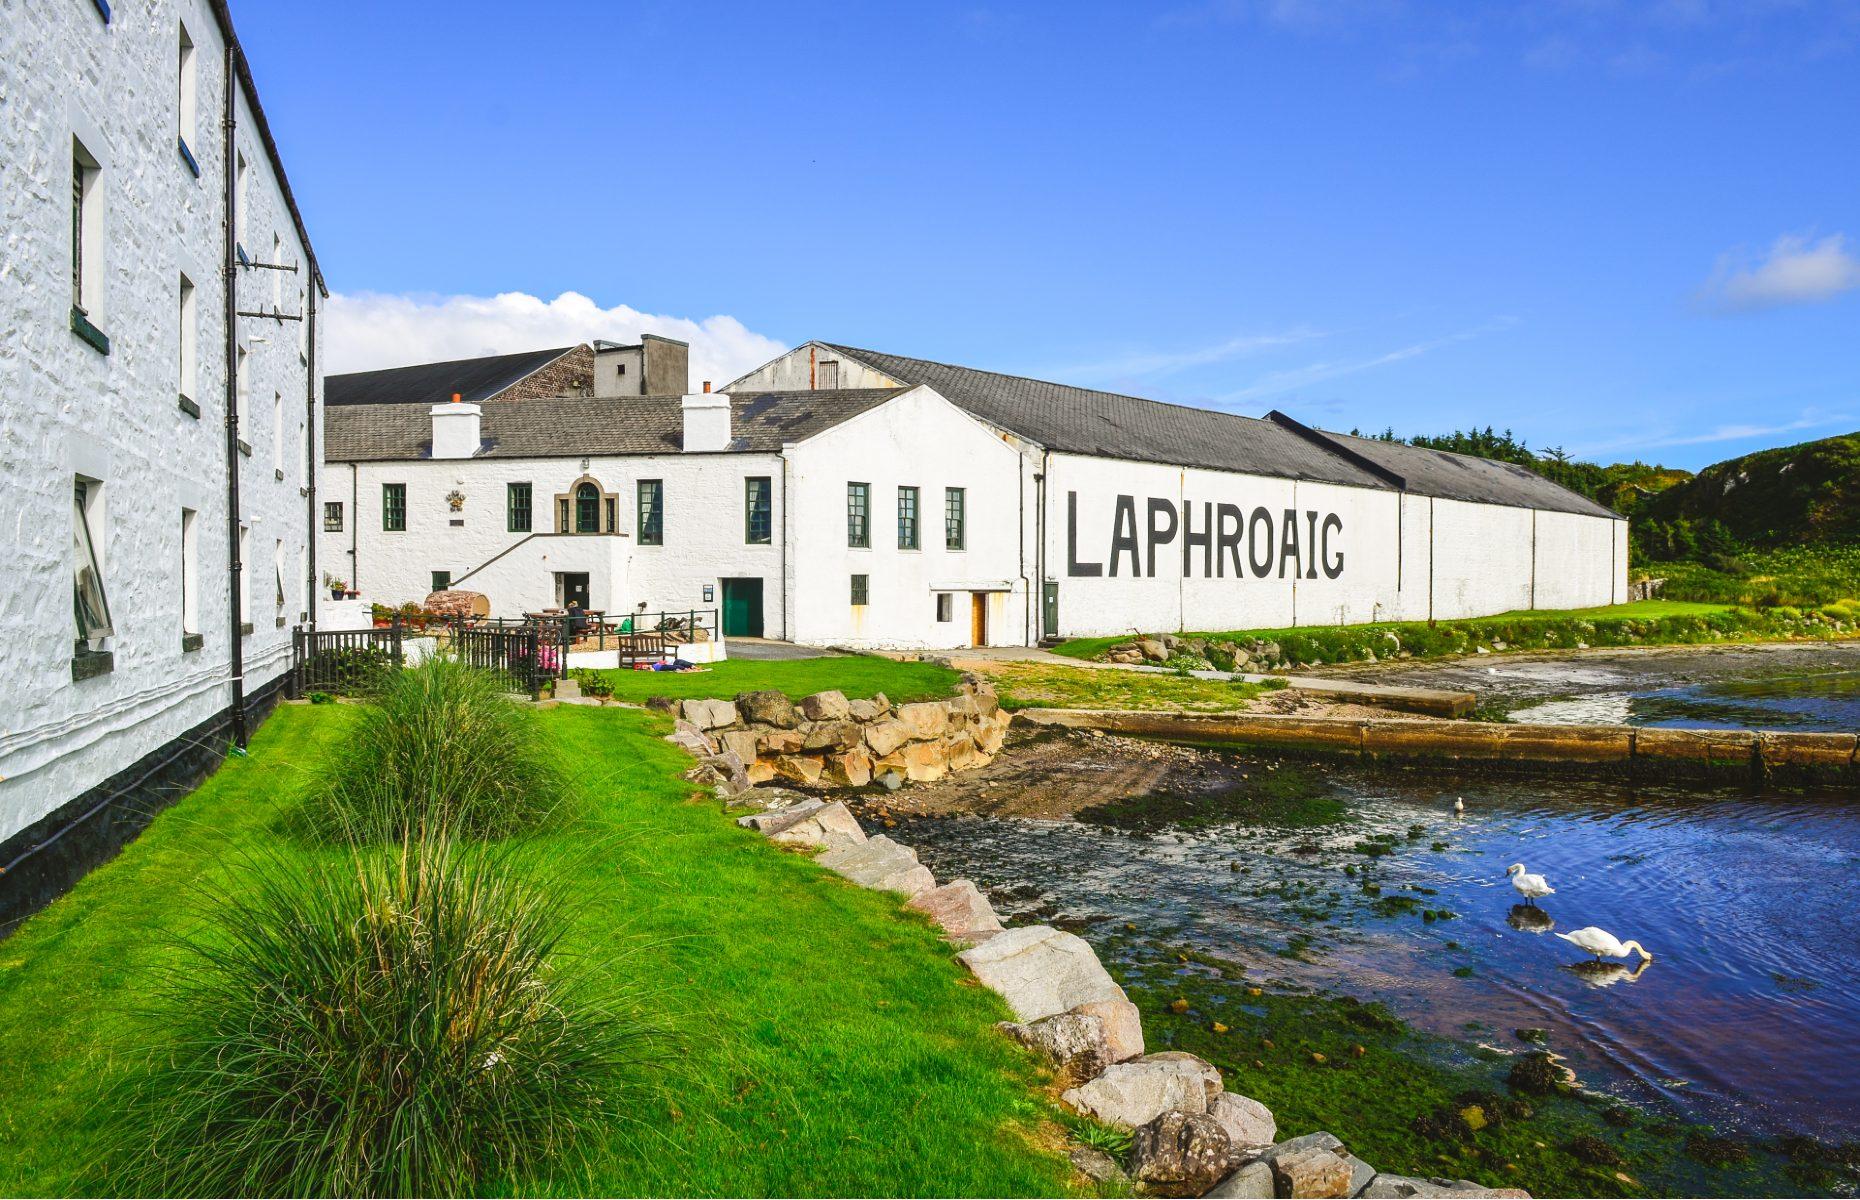 Laphroaig distillery (Image: Martin M303/Shutterstock)